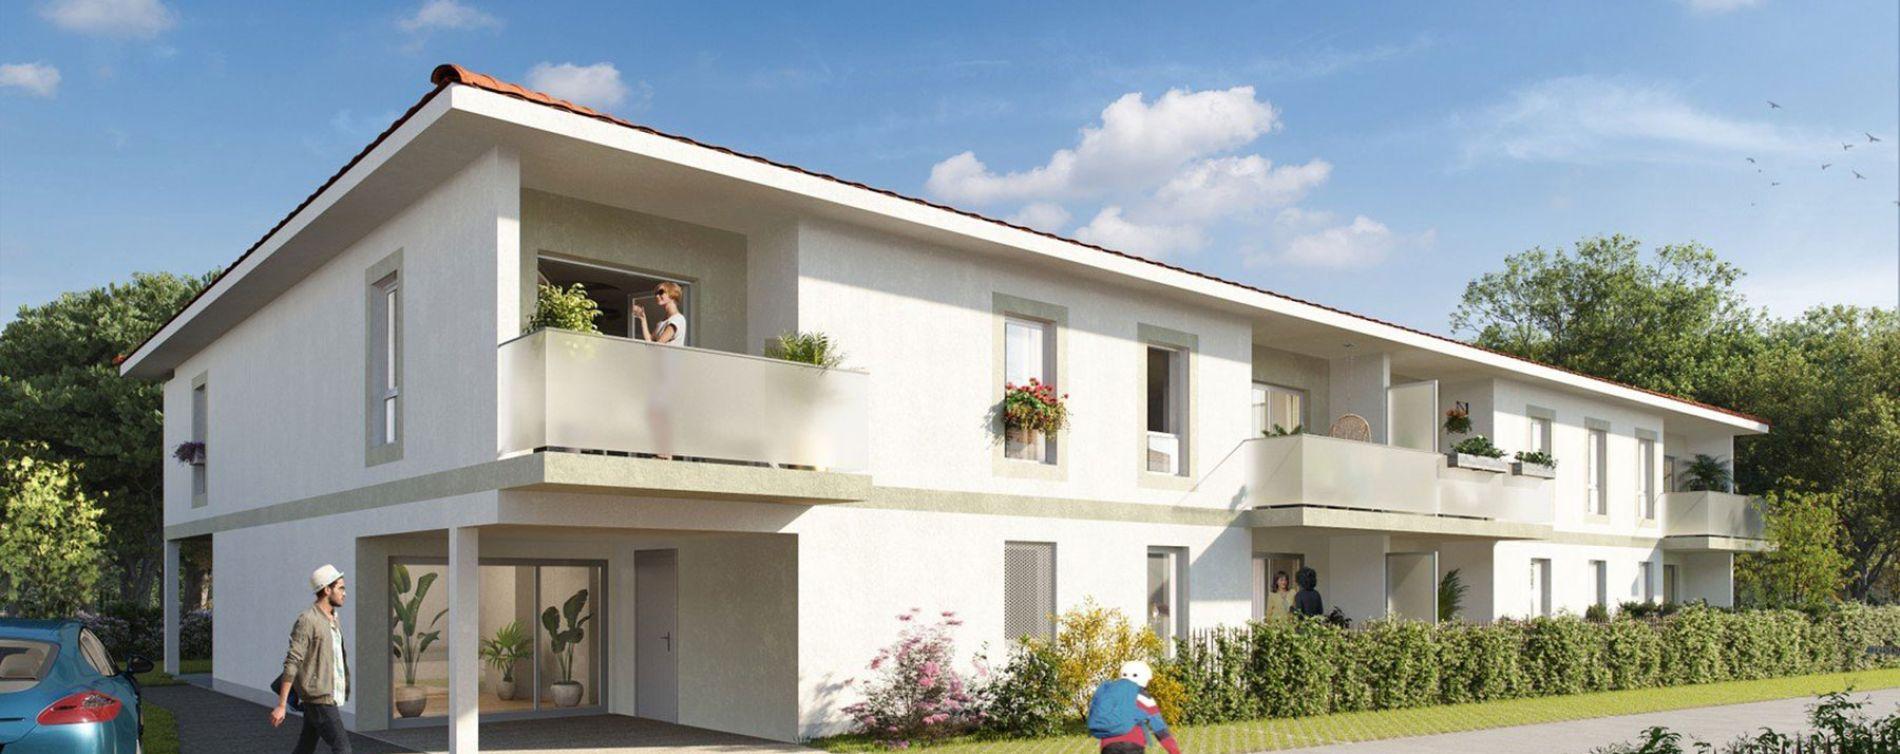 Saint-Jean-d'Illac : programme immobilier neuve « Euphoria » (2)